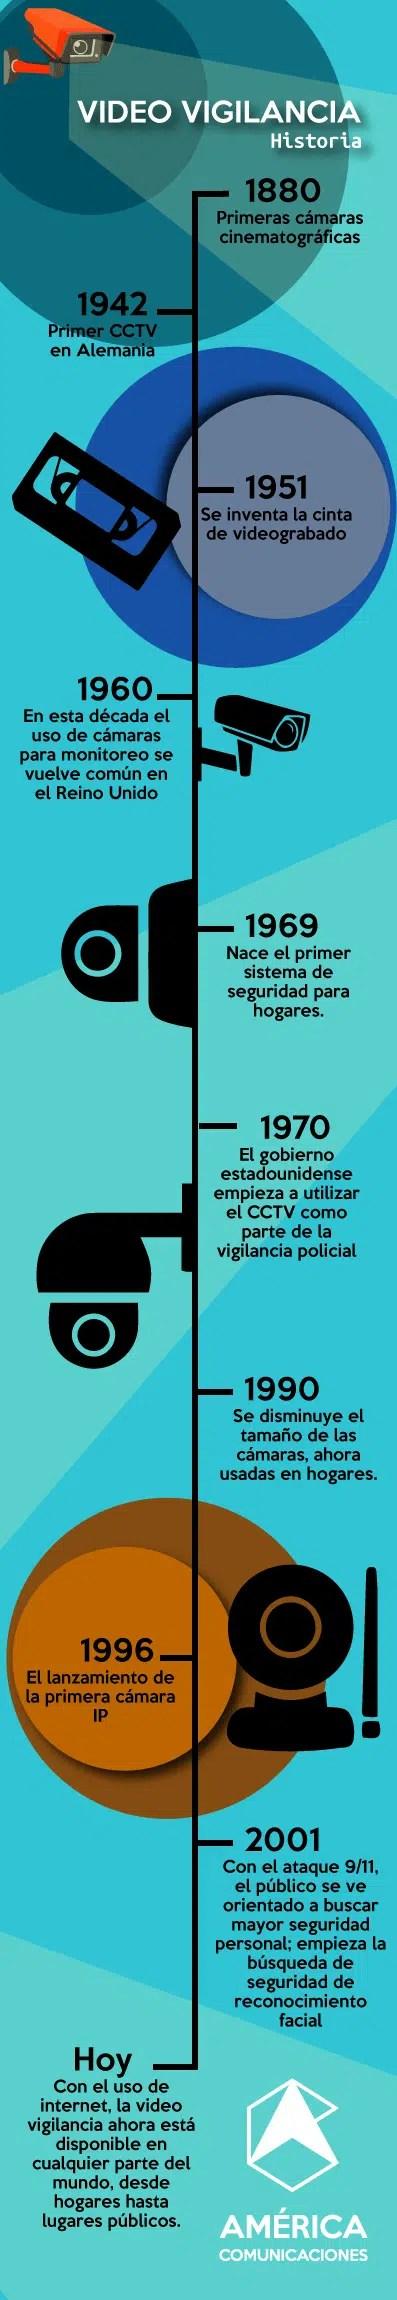 América_Comunicaciones_Videovigilancia